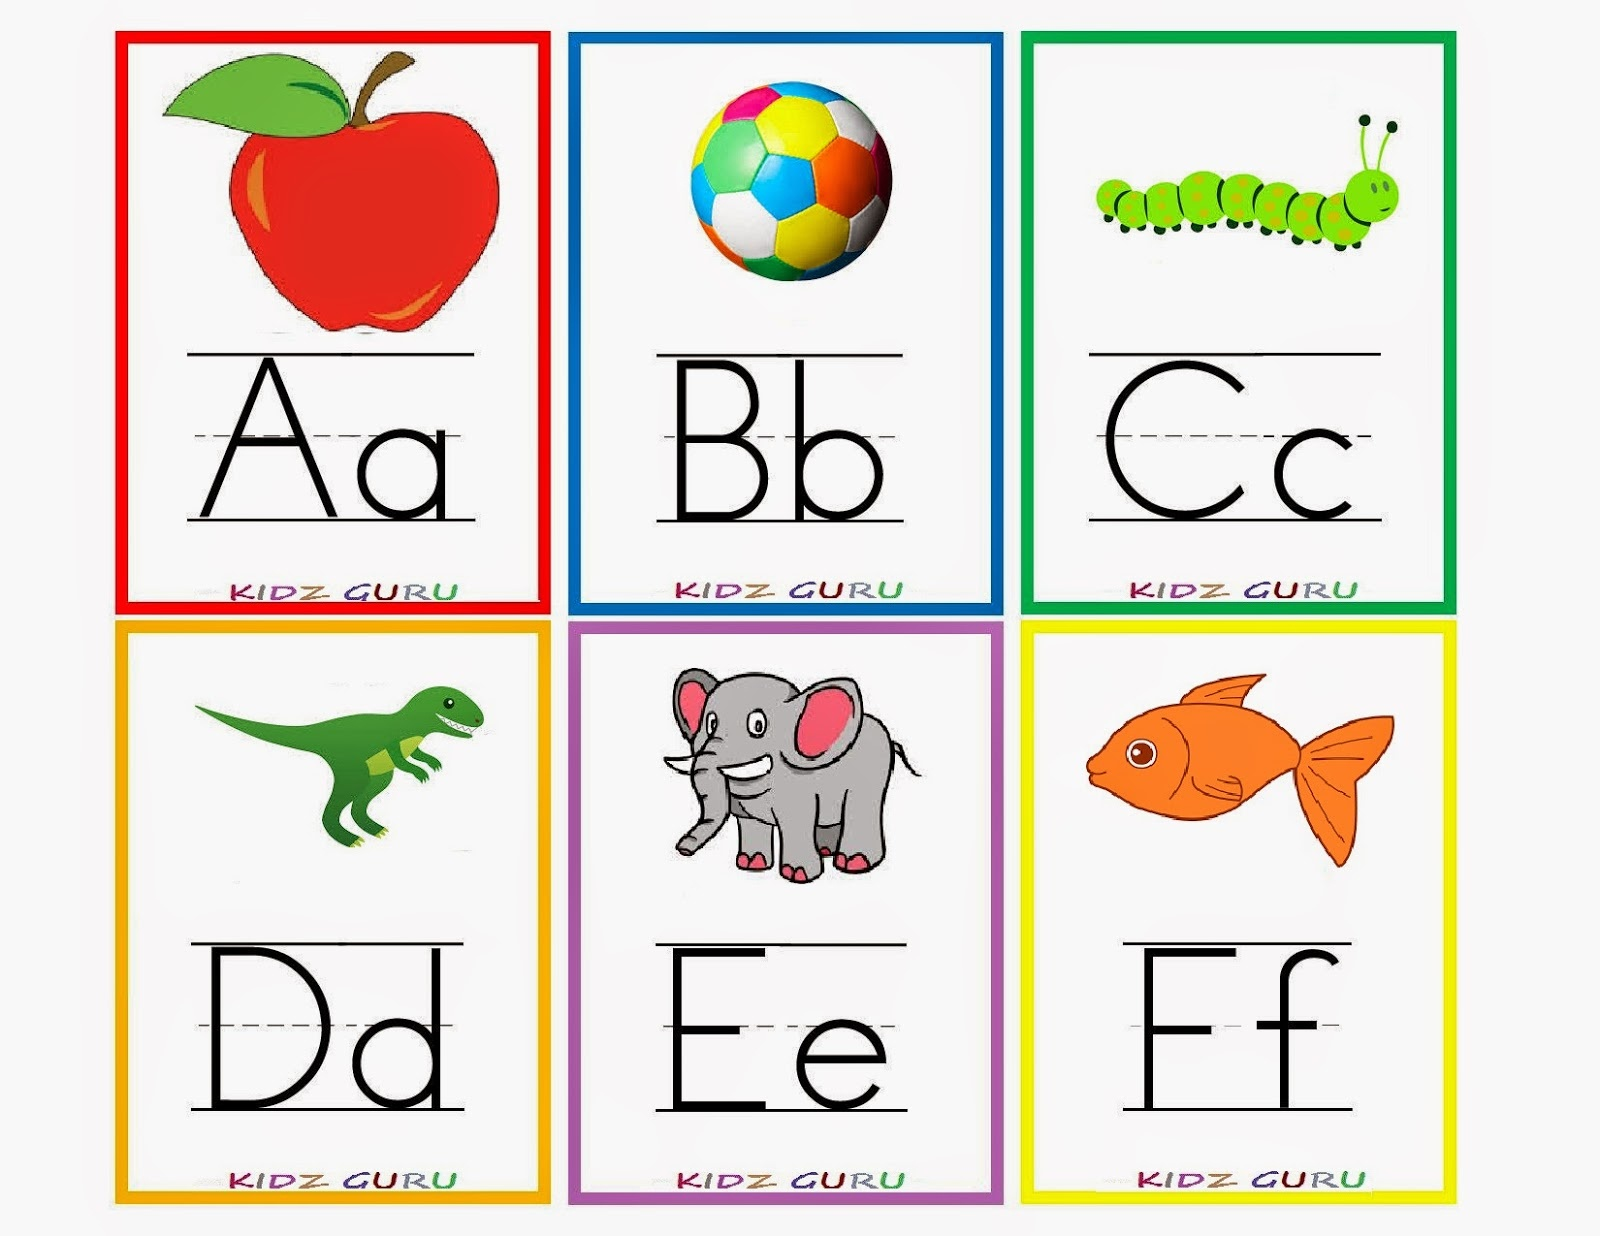 Kindergarten Worksheets: Printable Worksheets - Alphabet Flash Cards 1 - Free Printable Alphabet Cards With Pictures